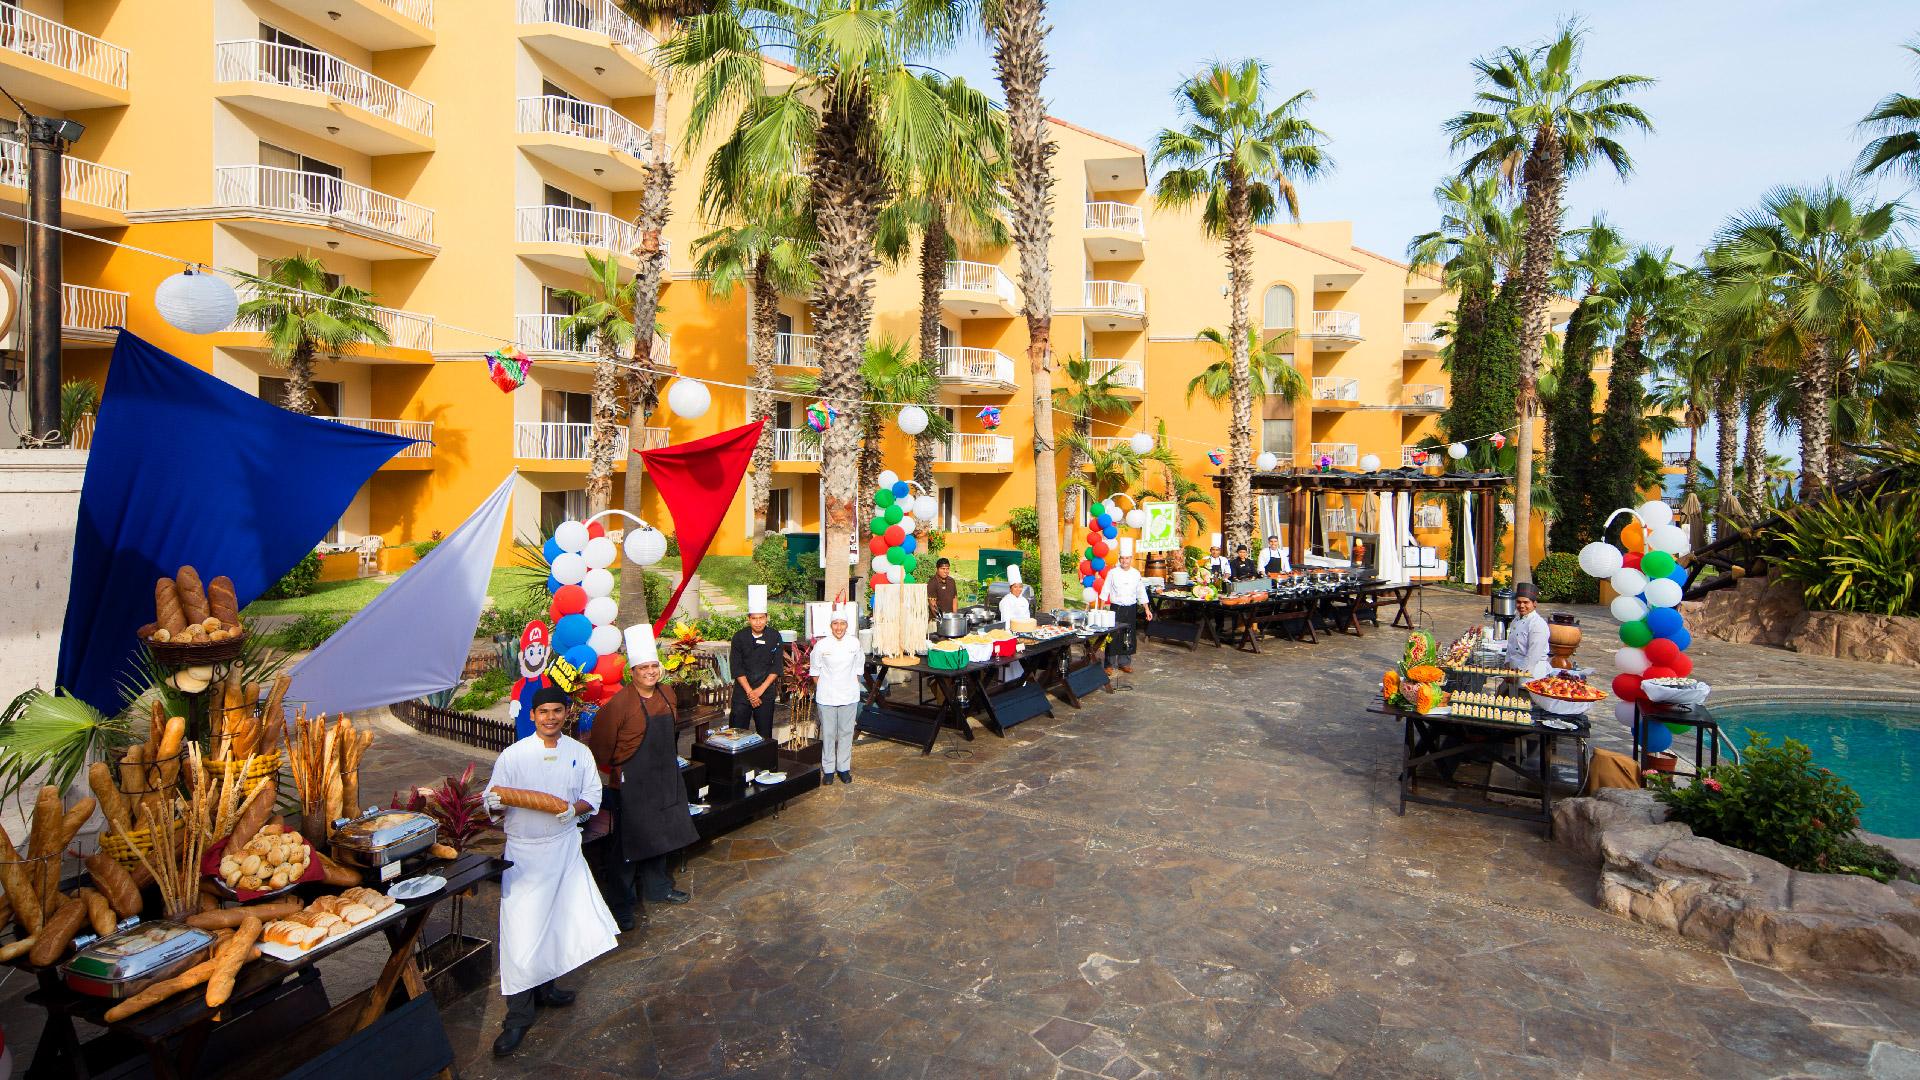 Villa del palmar cabo san lucas tortugas terrace restaurant 3